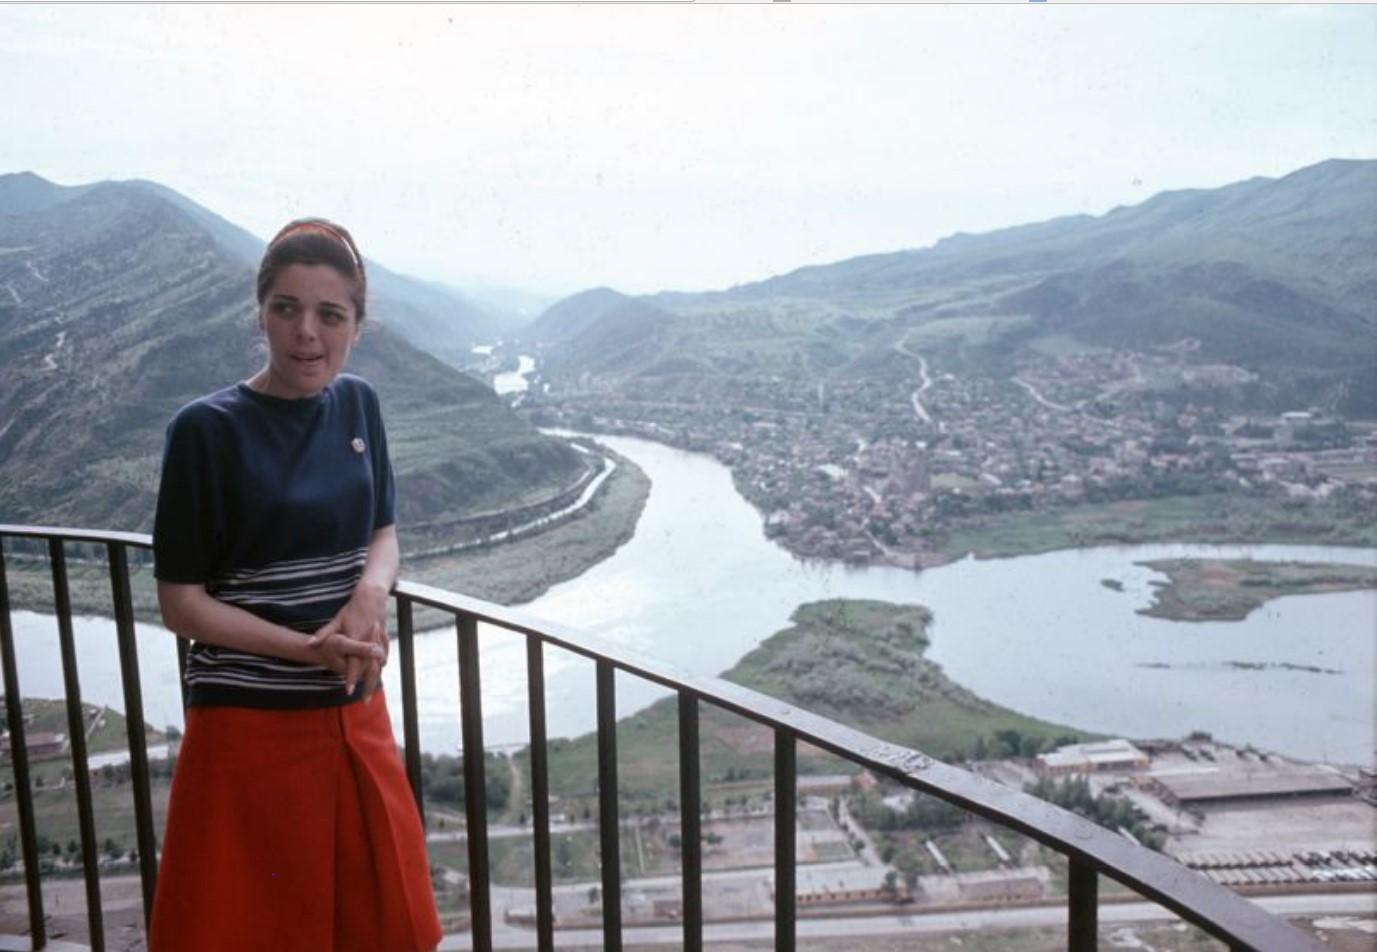 Тбилиси. Женщина на балконе